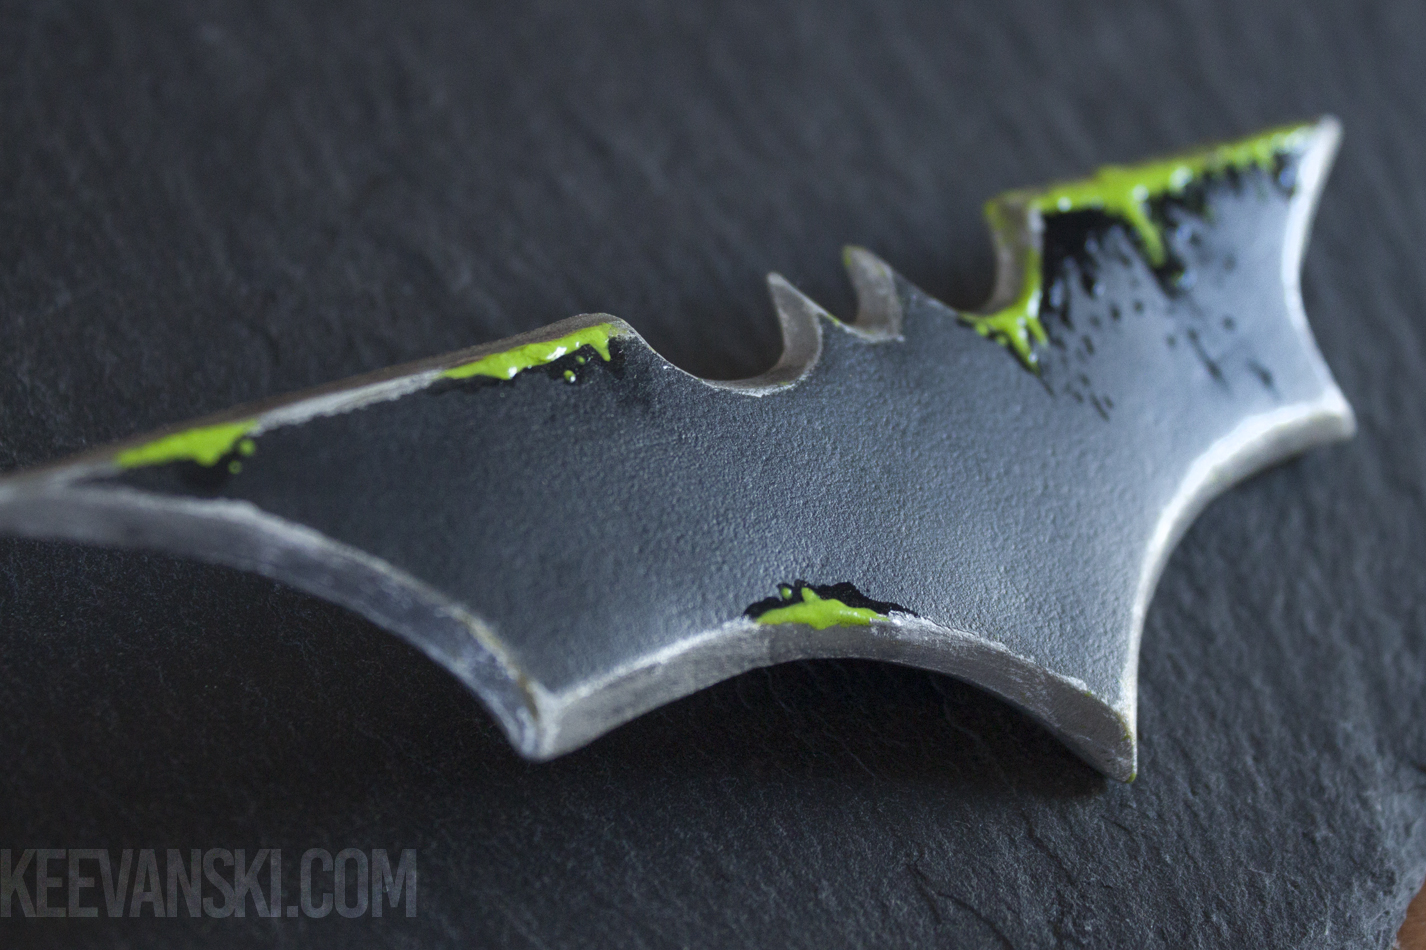 Batarang_Worbla_2_by_Keevanski